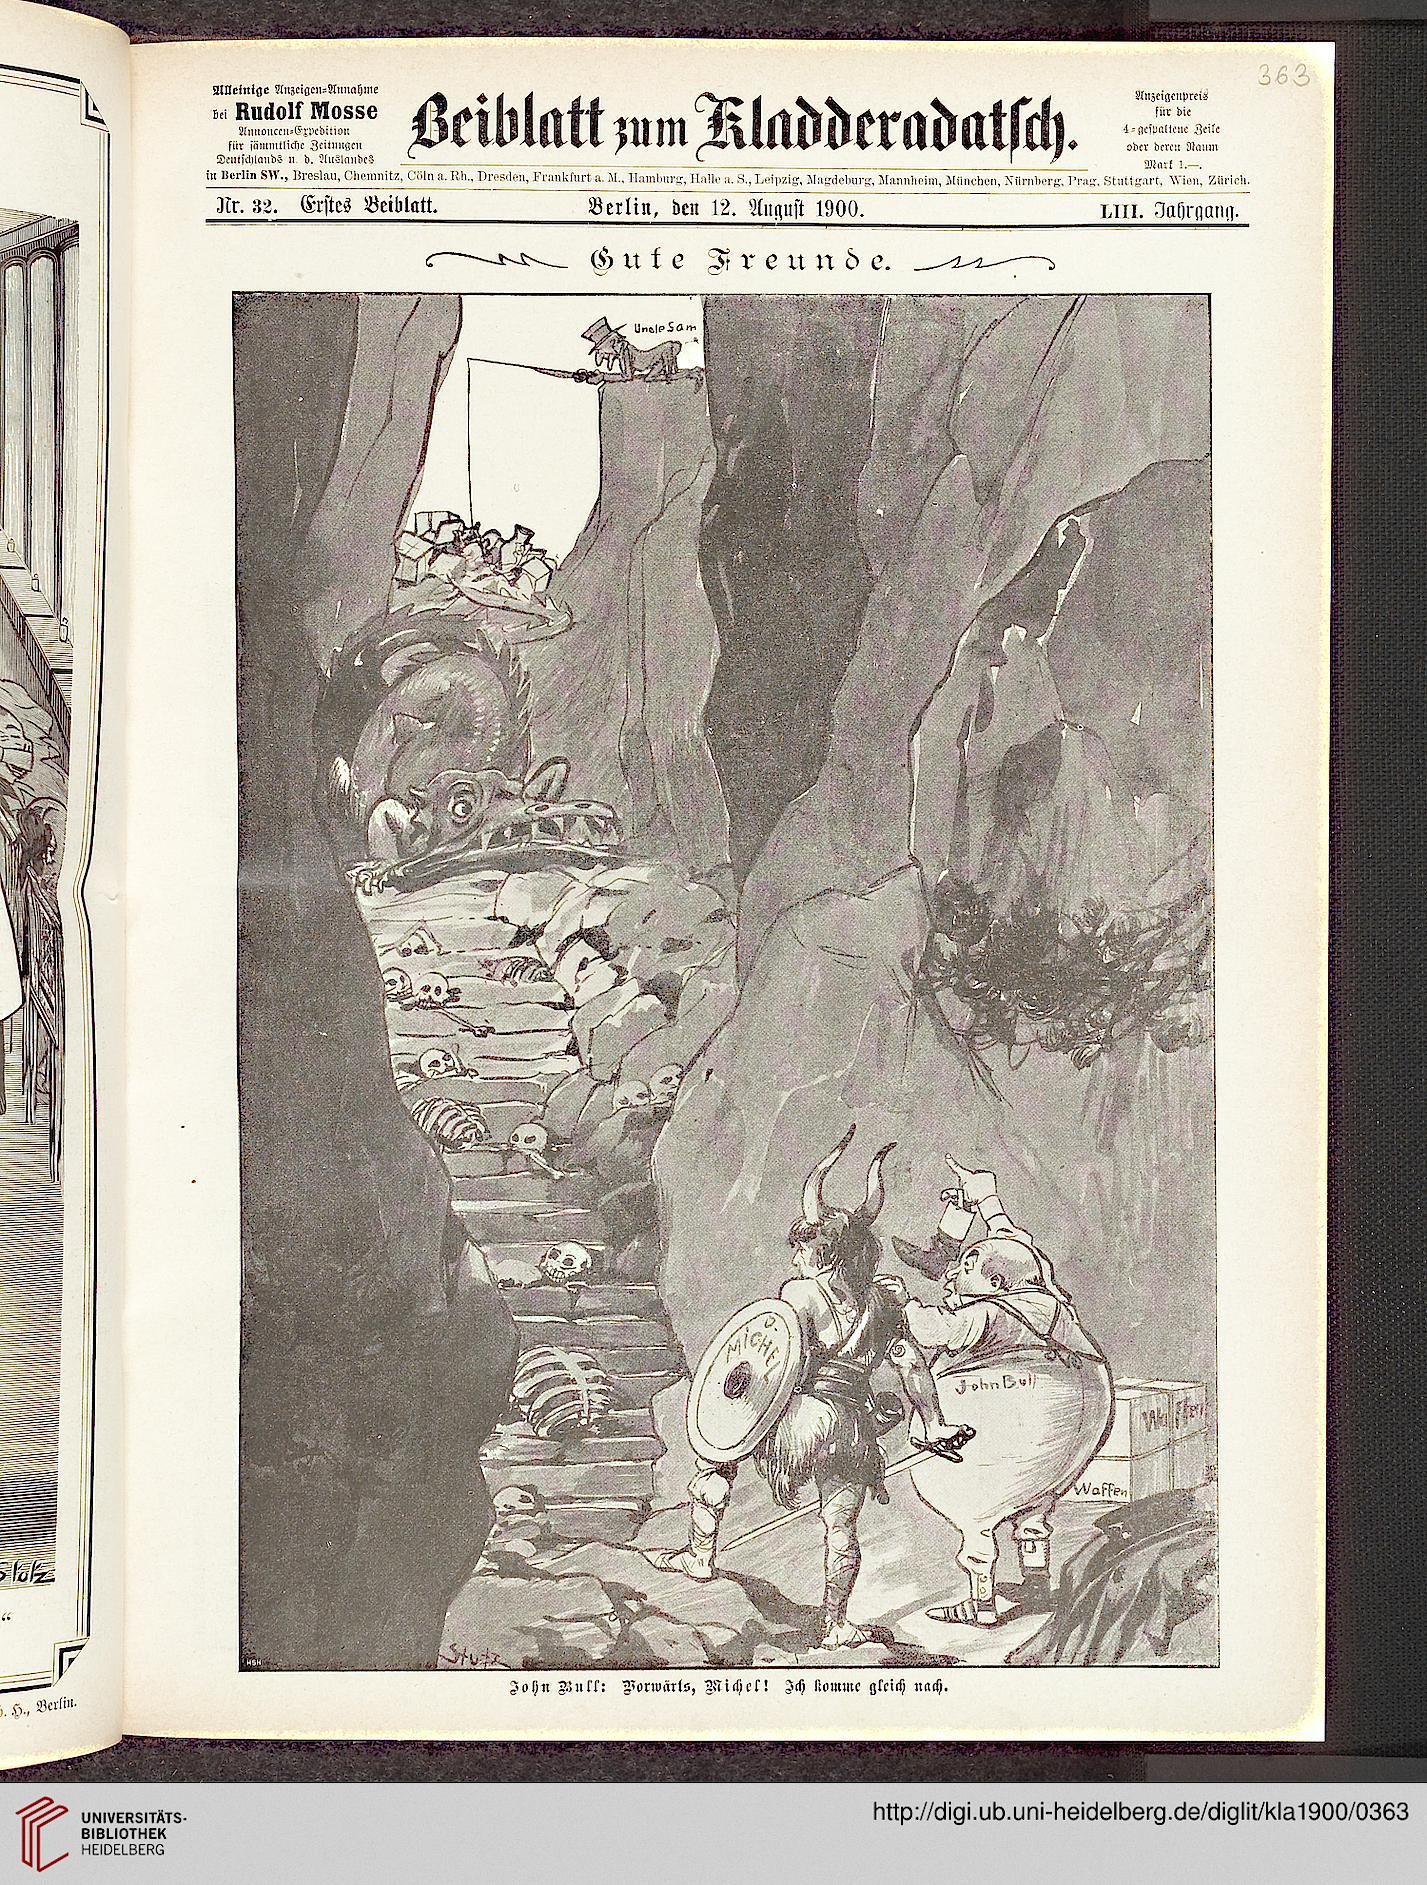 Kladderadatsch (Beiblatt), 12.8. 1900